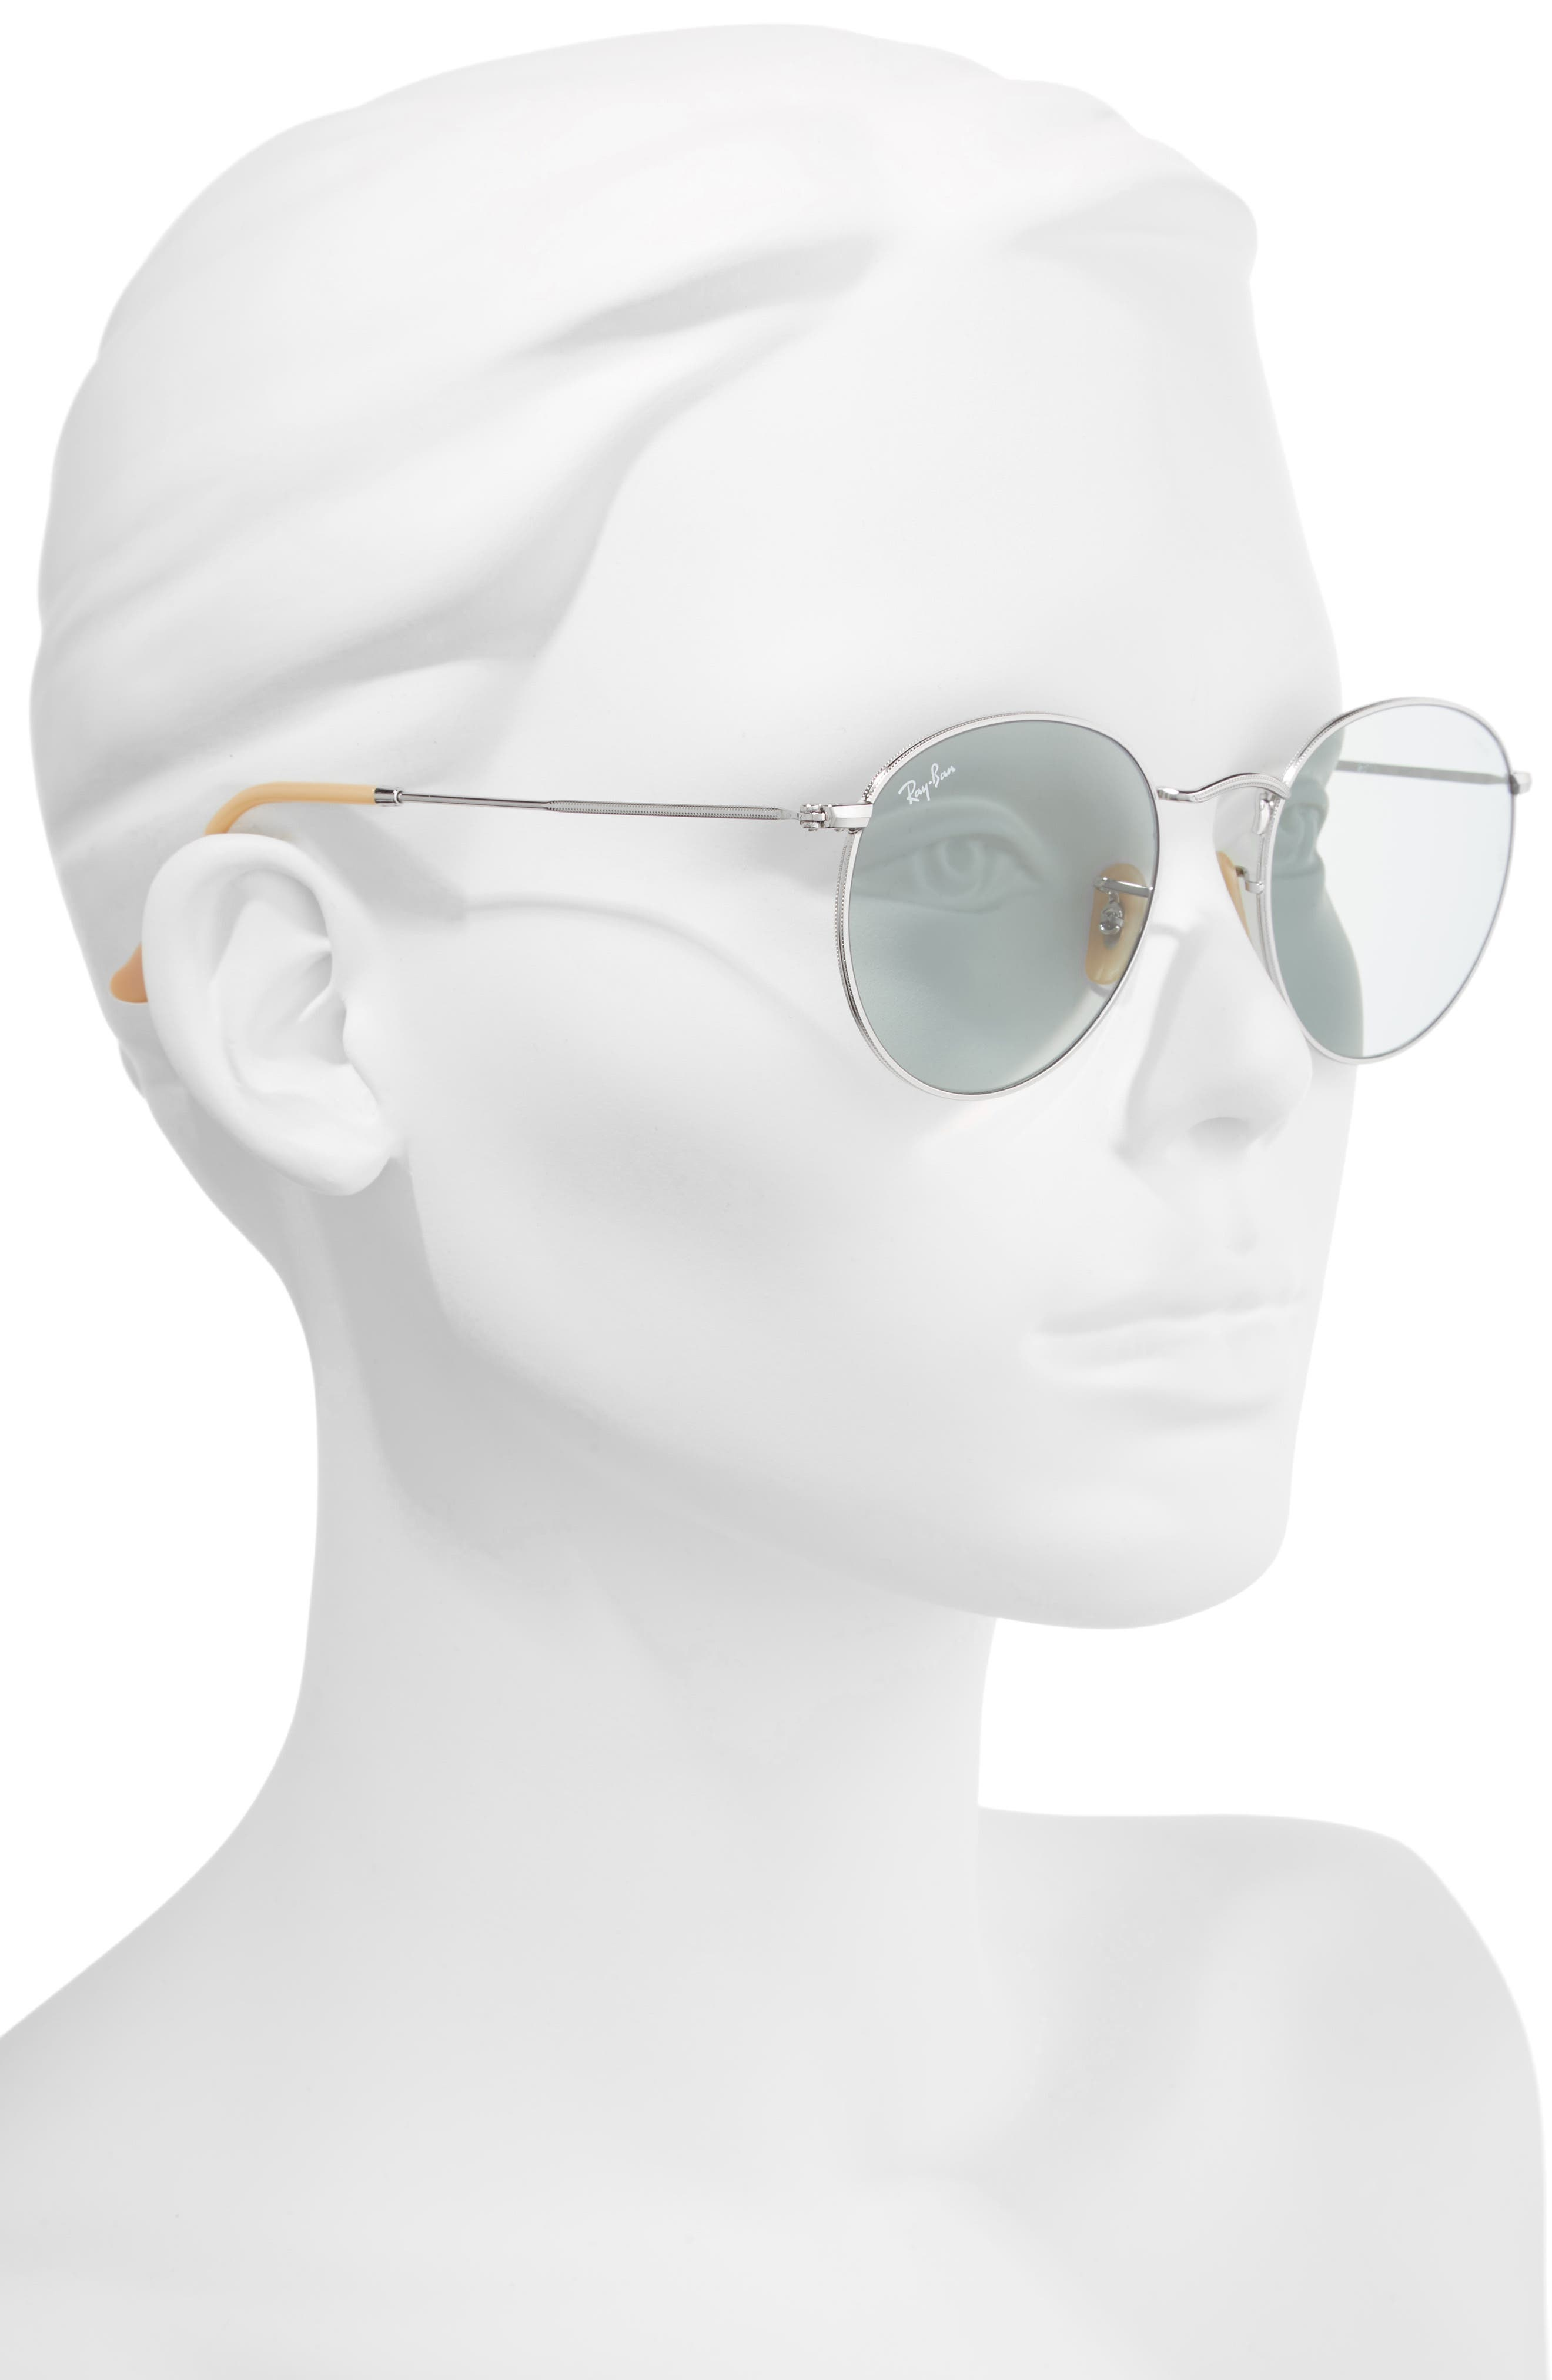 53mm Polarized Round Sunglasses,                             Alternate thumbnail 2, color,                             Silver Blue